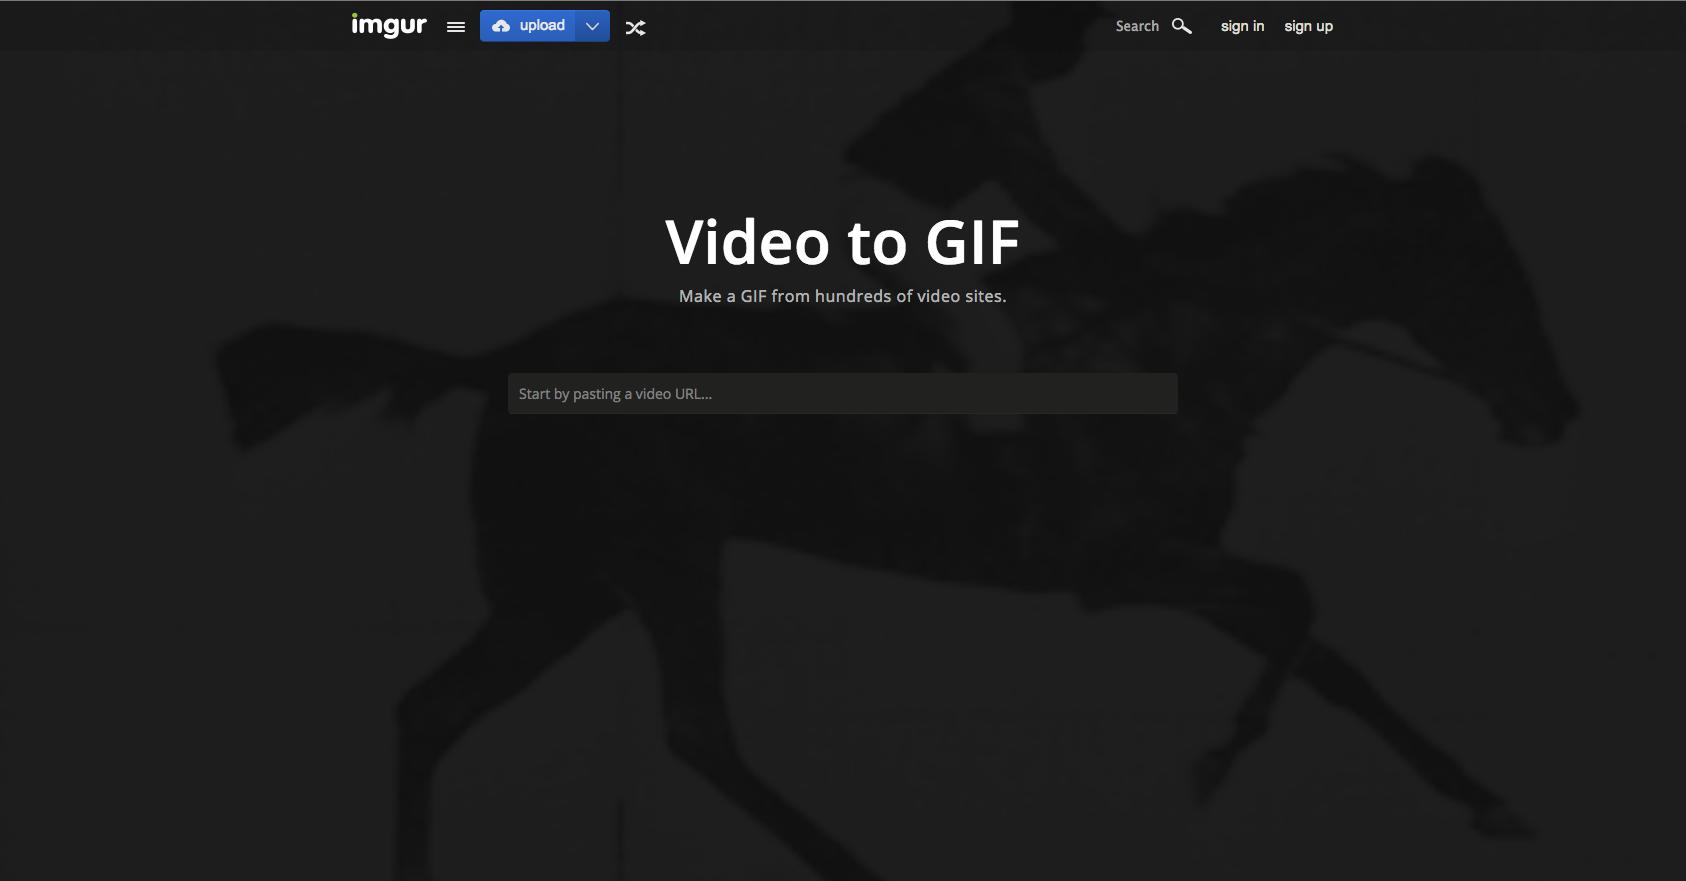 Imgur-ը GIF նկարներ ստեղծելու համար նախատեսված գործիք է թողարկել